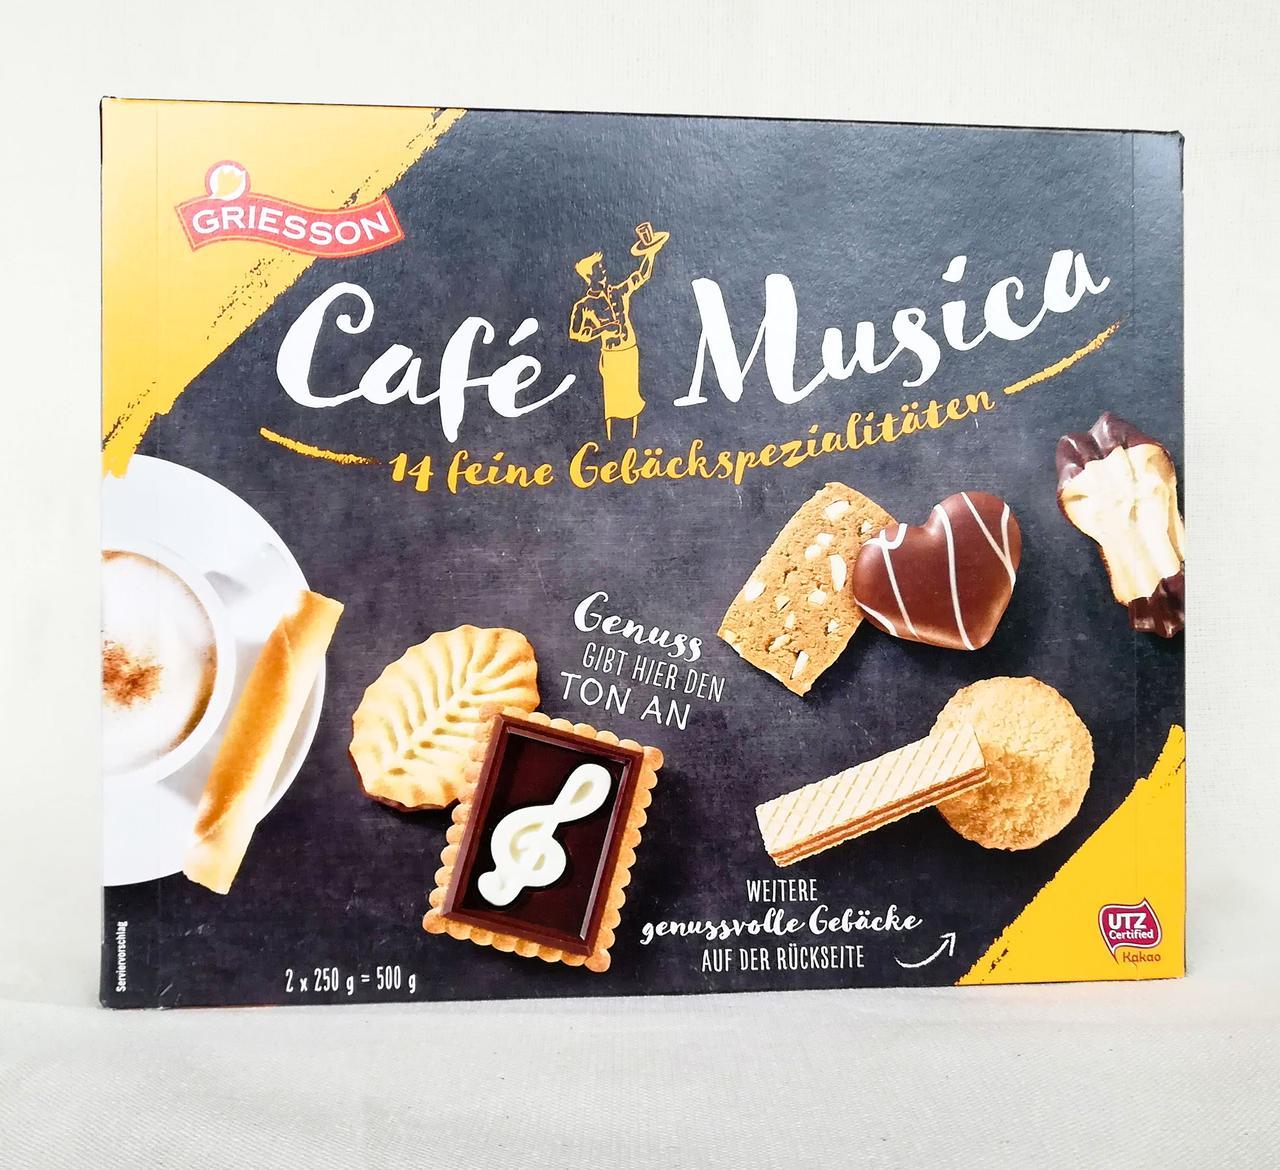 Печенье Griesson Cafe Musica